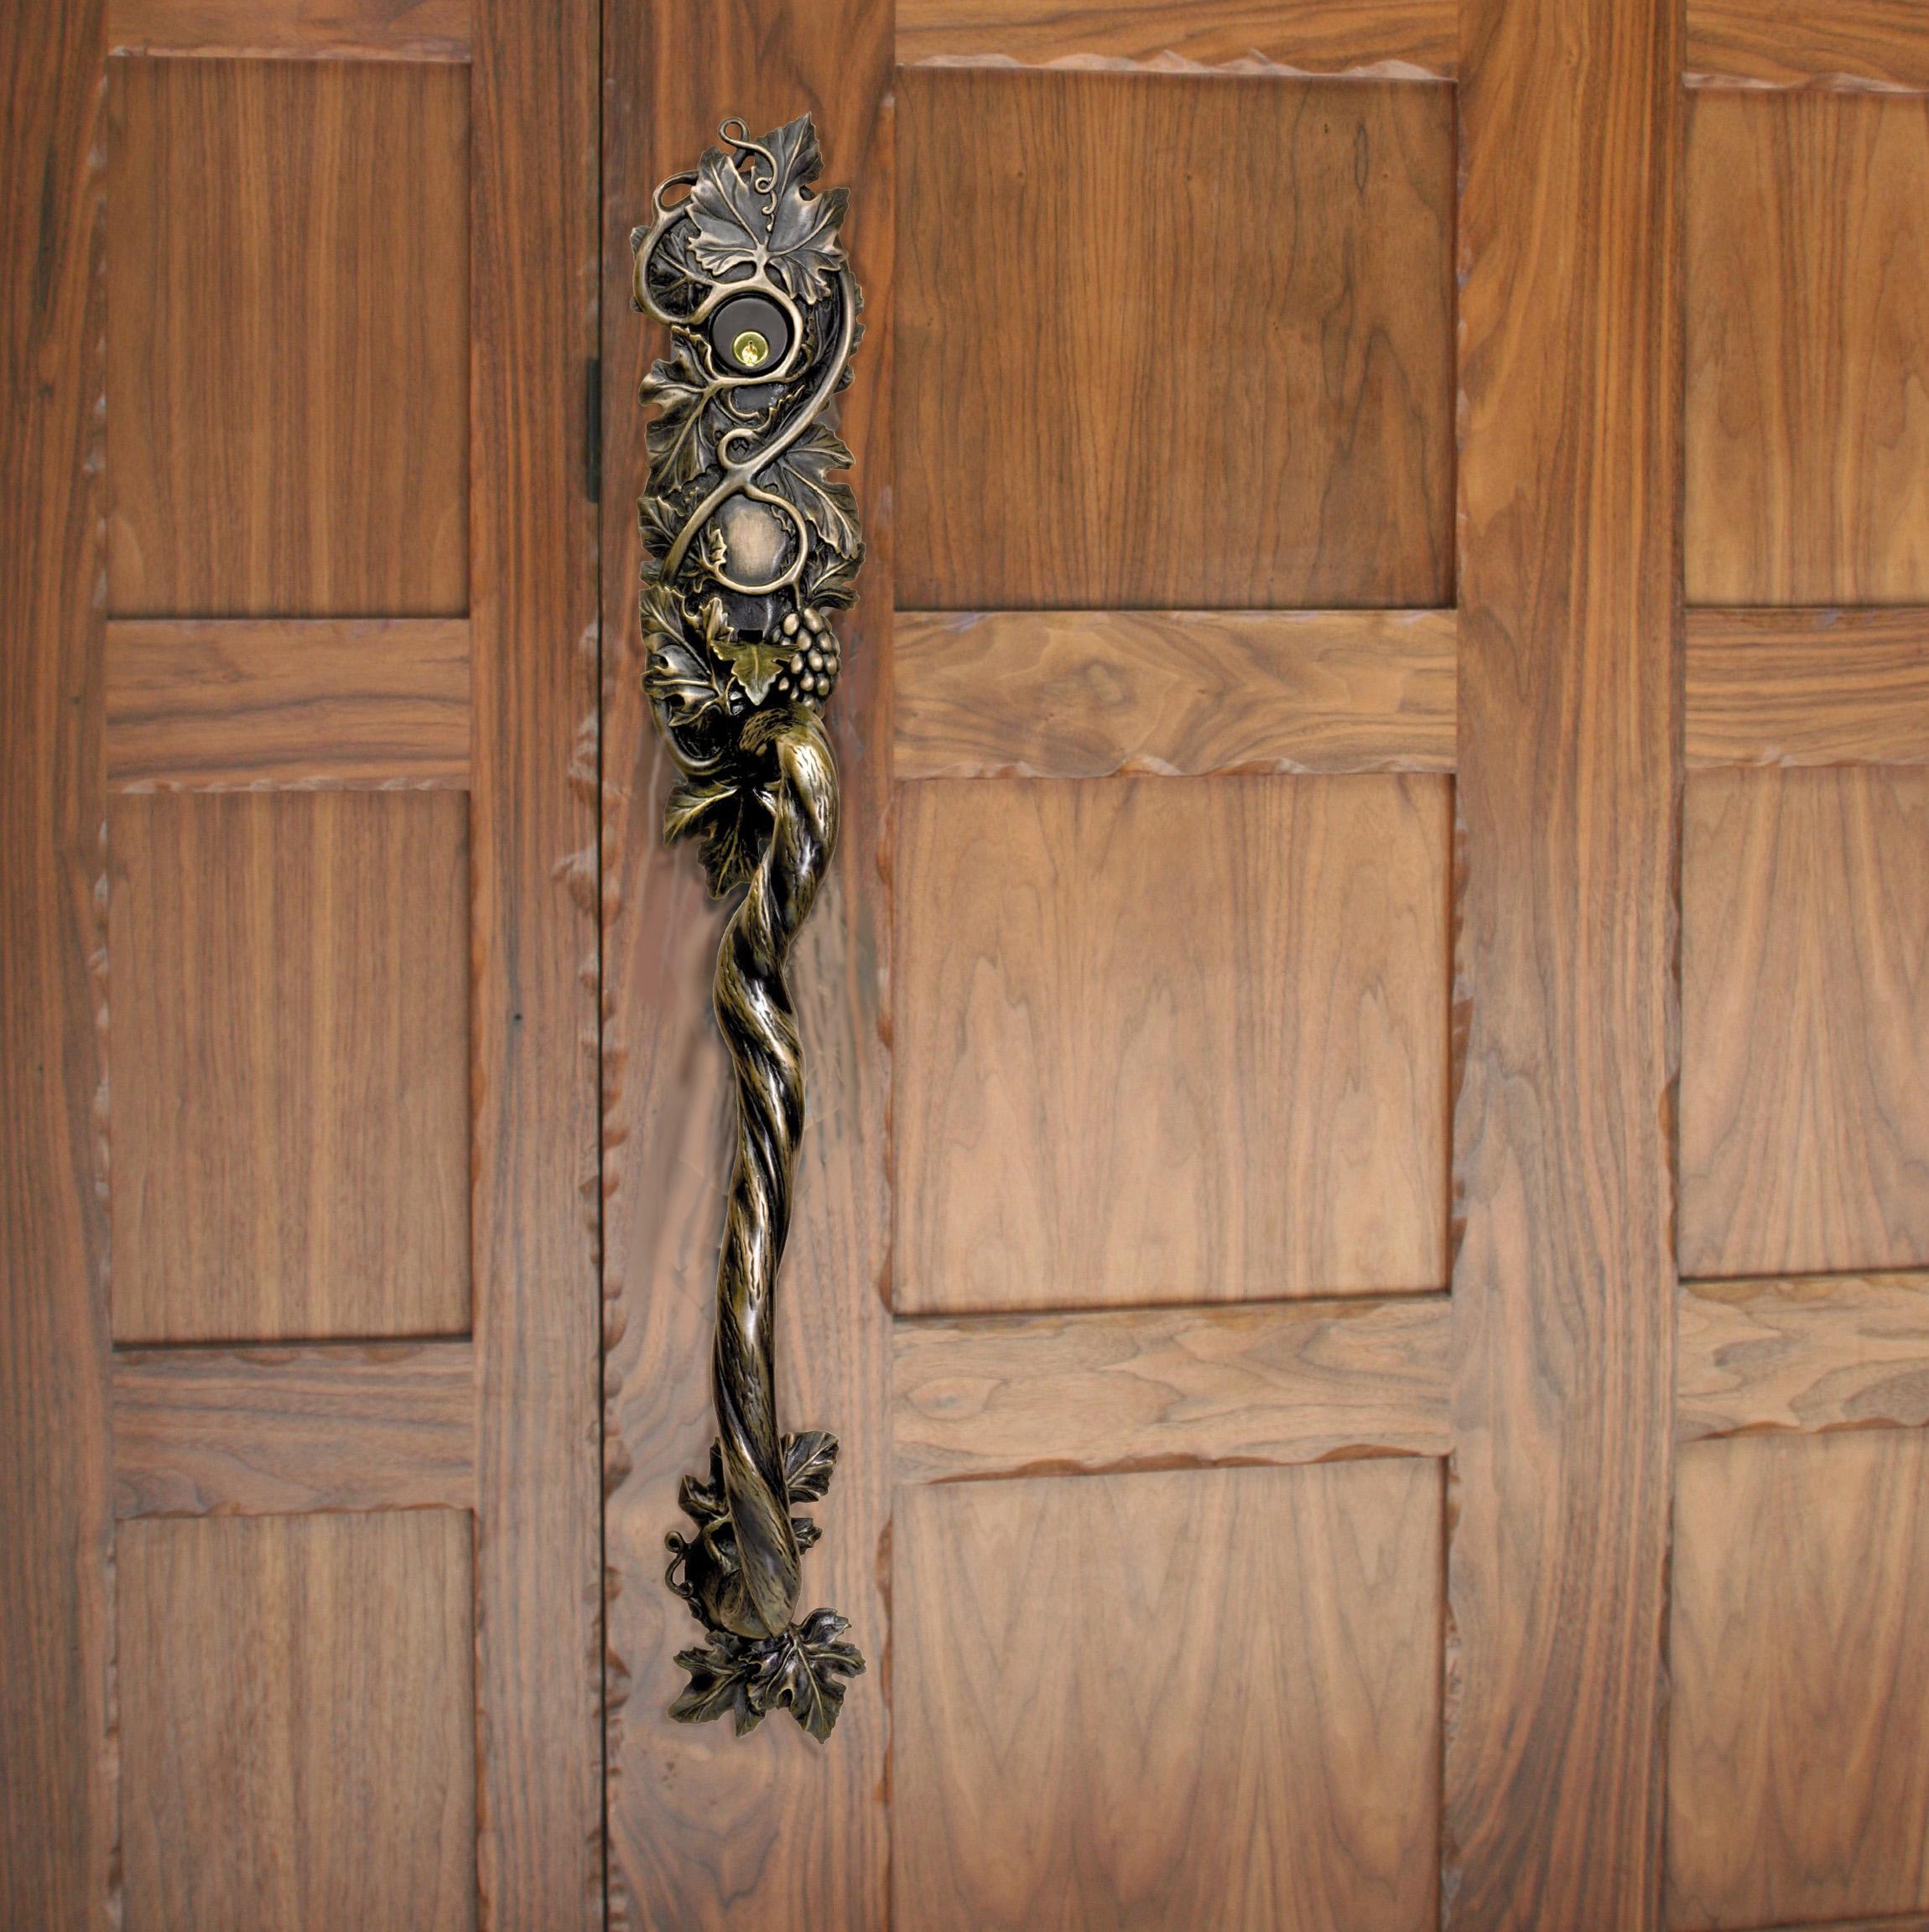 Grapevine entry door  latch